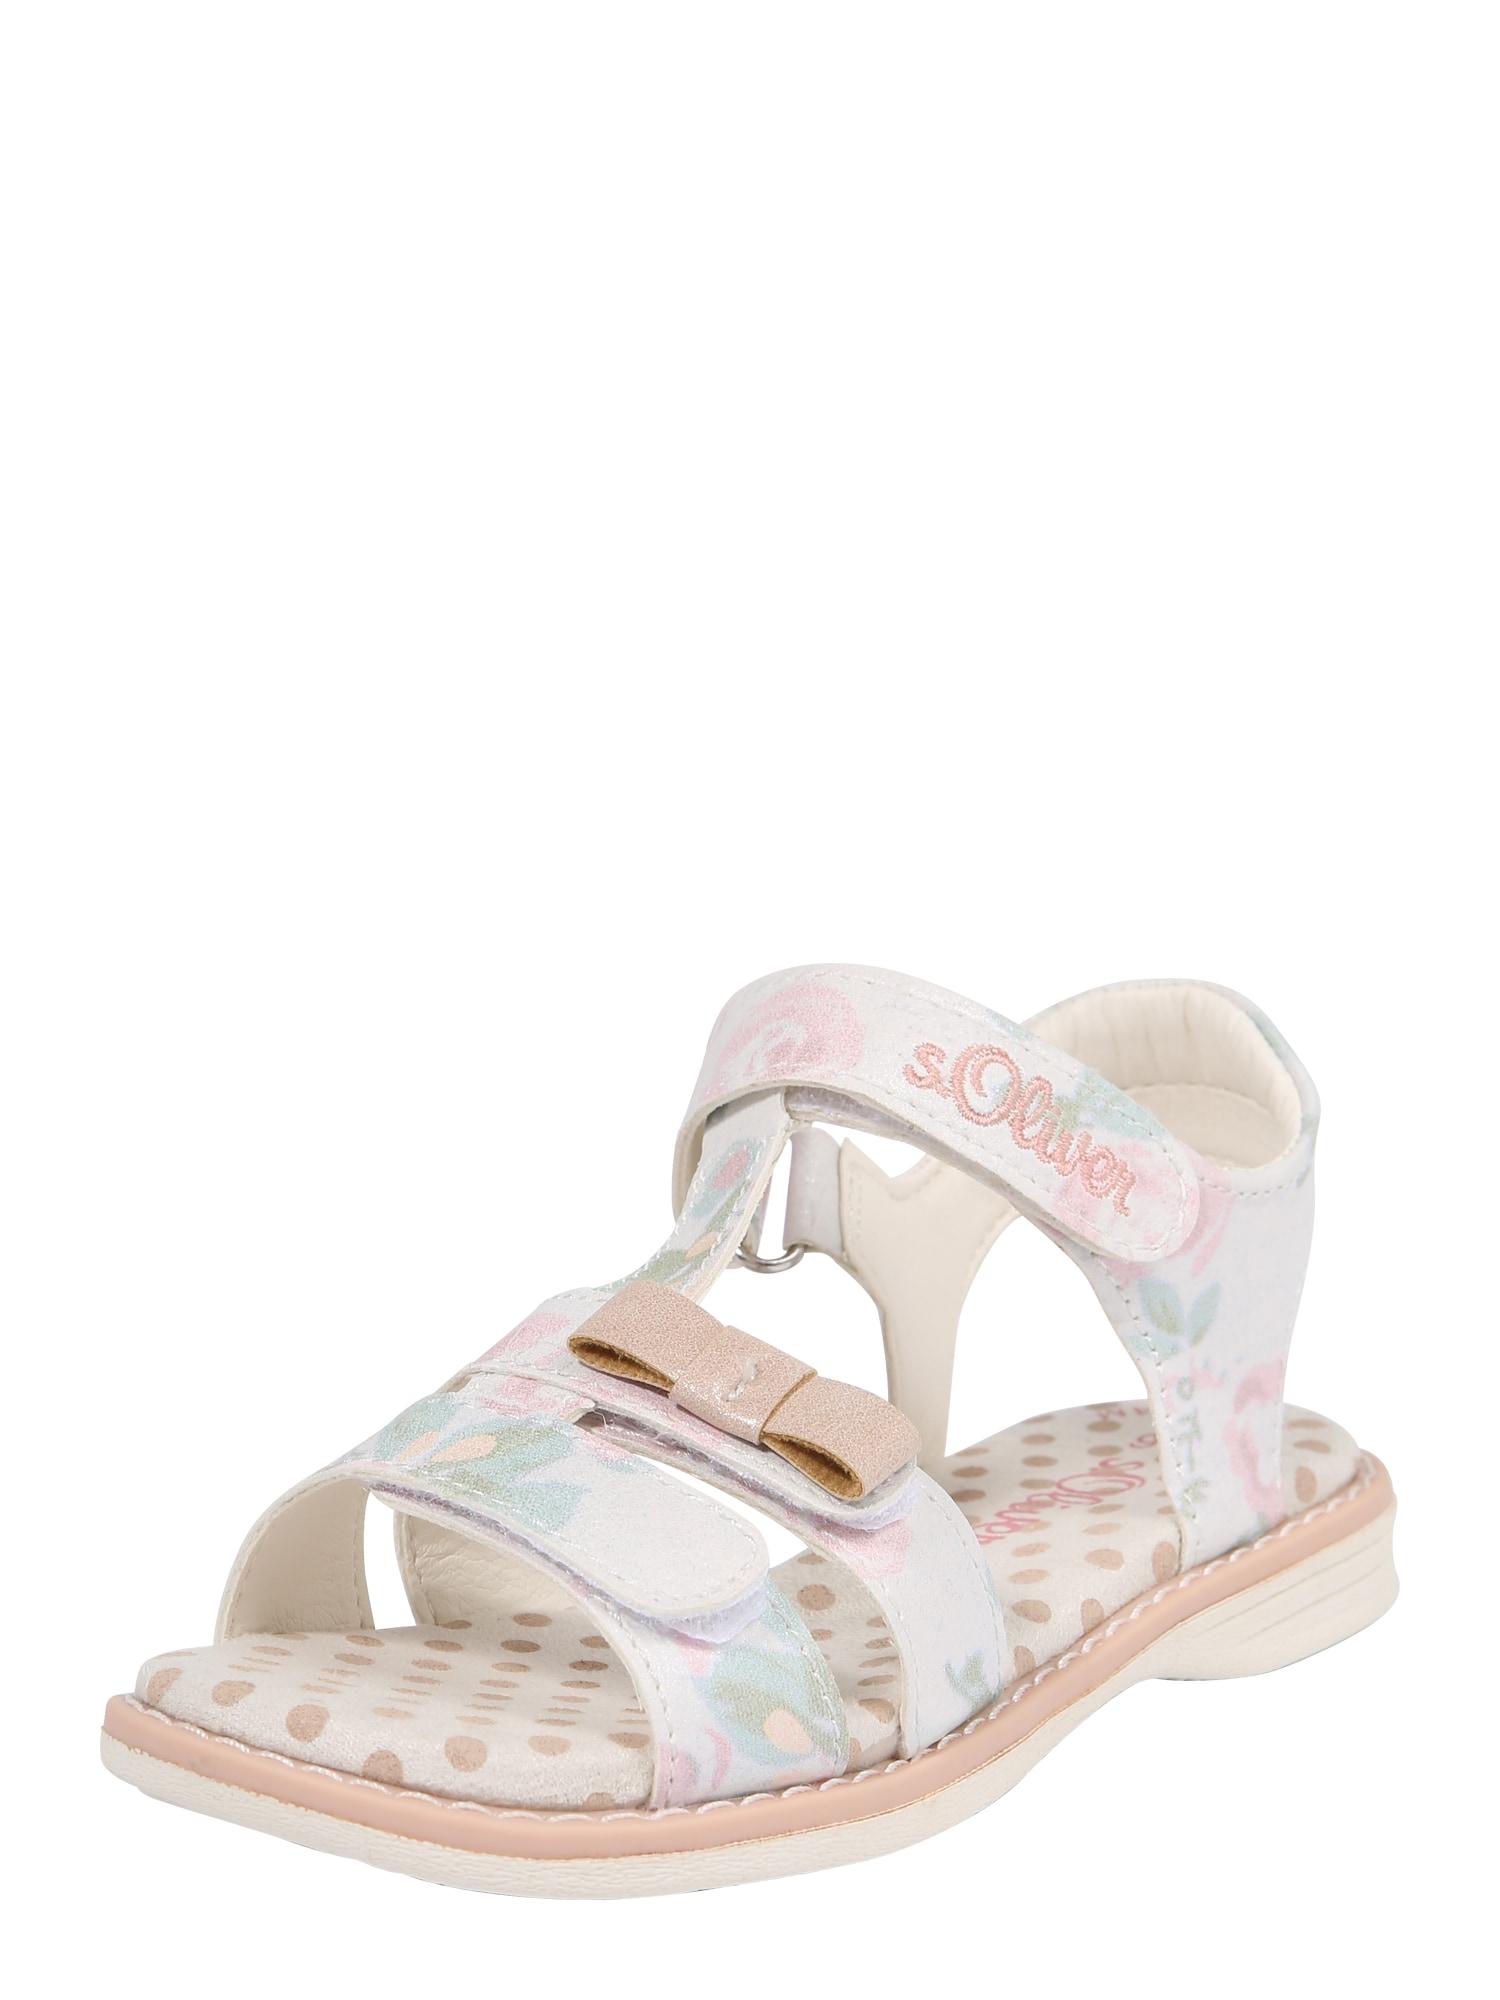 Sandály mix barev bílá S.Oliver Junior